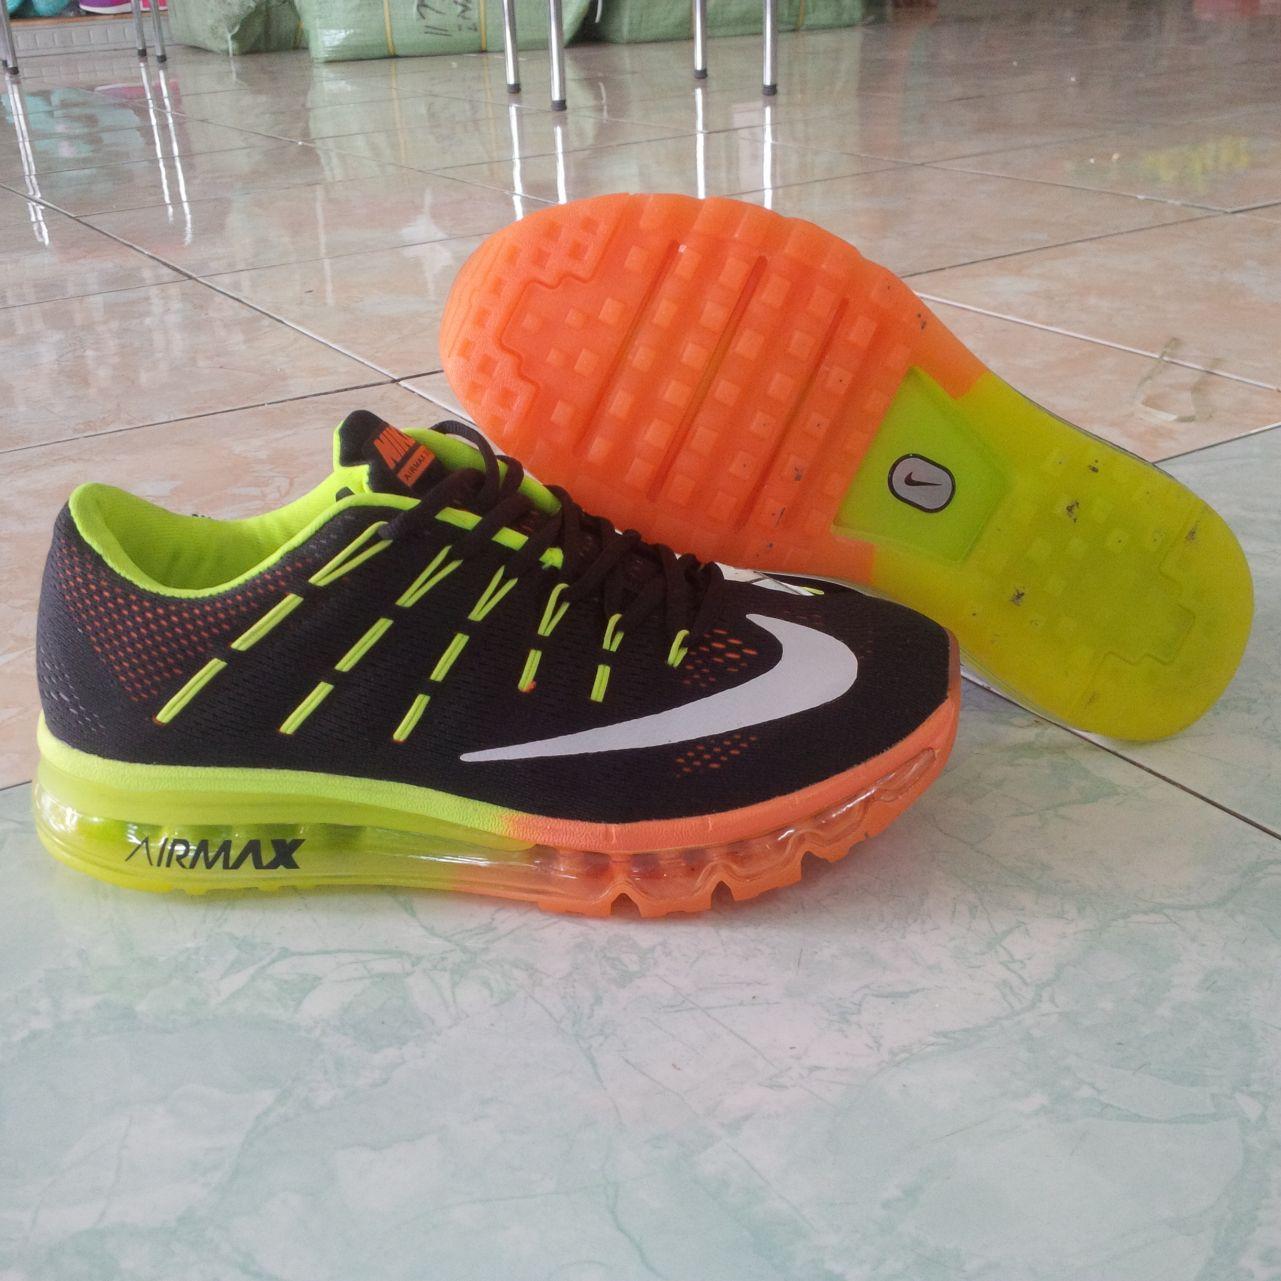 terbaru sepatu nike airmax nike fitsole full tabung army forman NK994